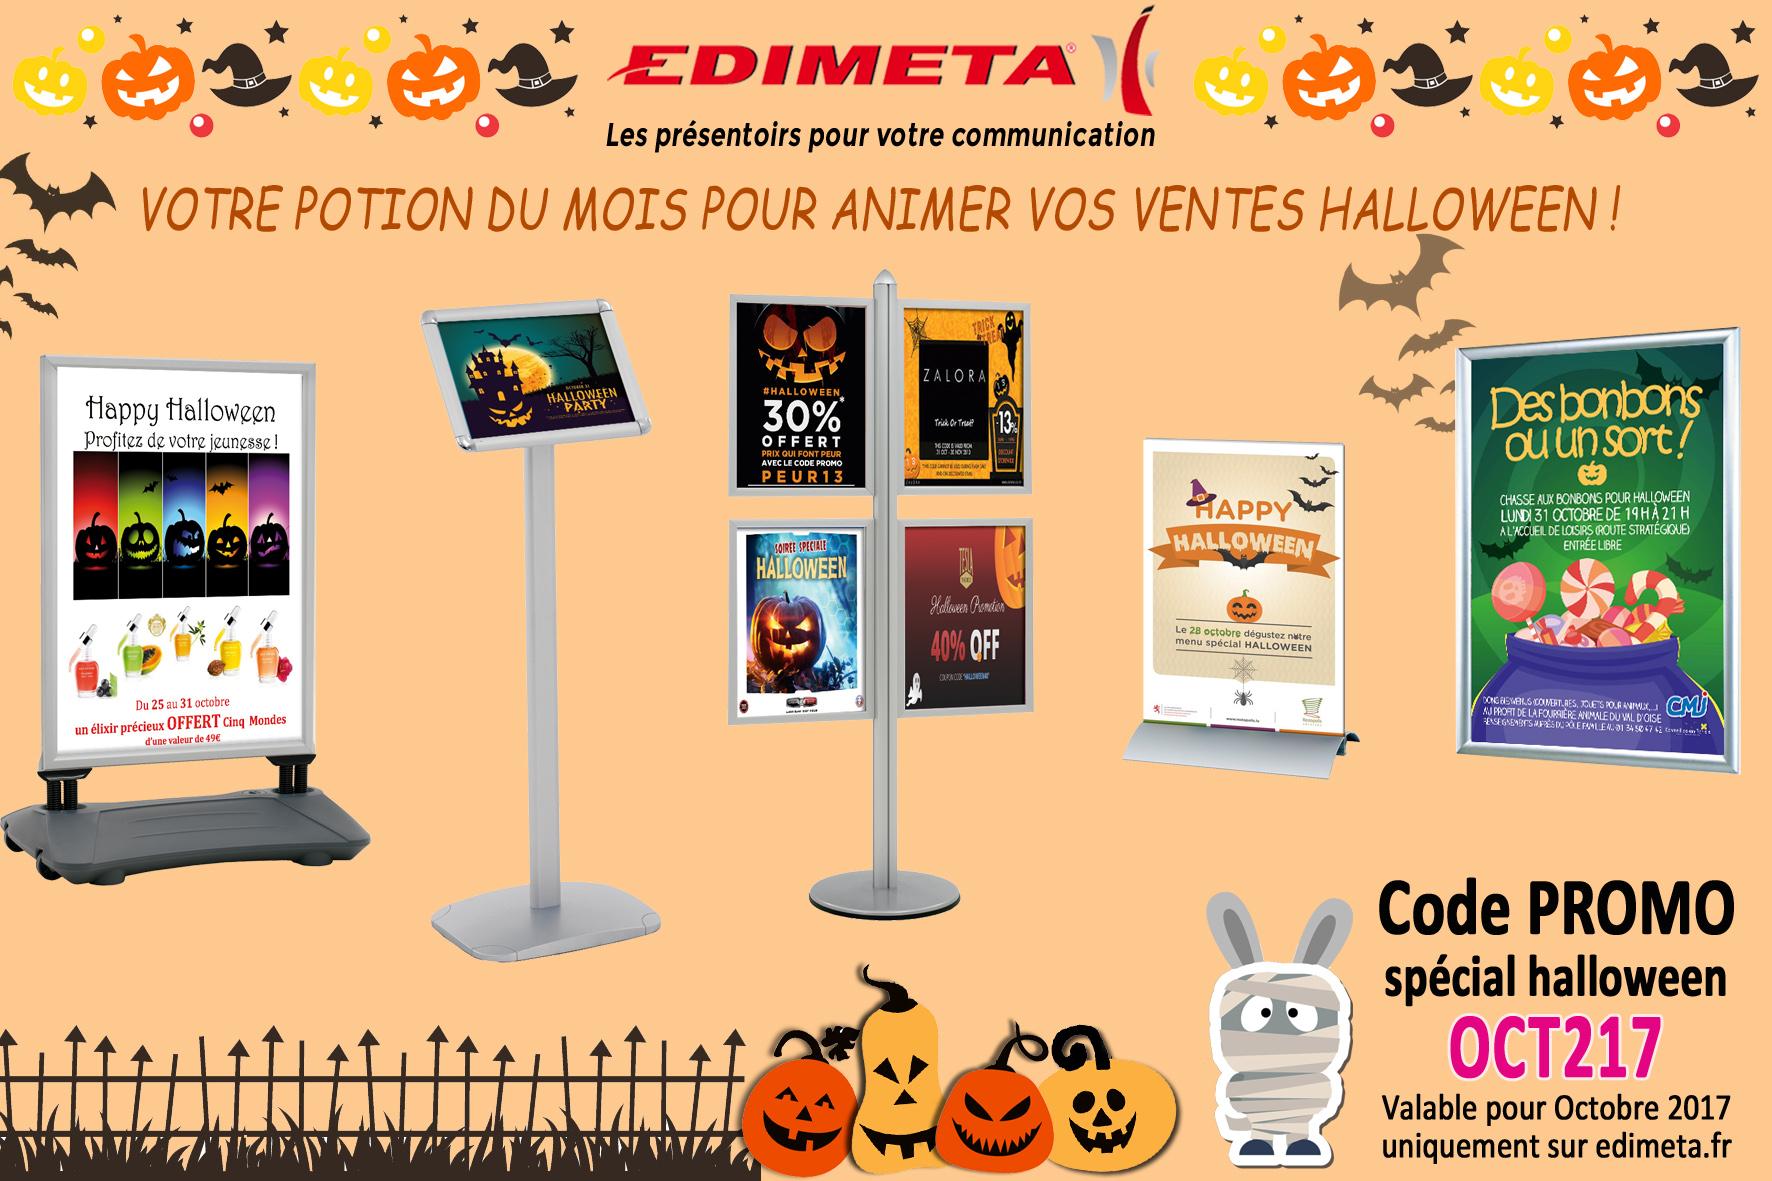 EDIMETA - Code promo pour Octobre 2017